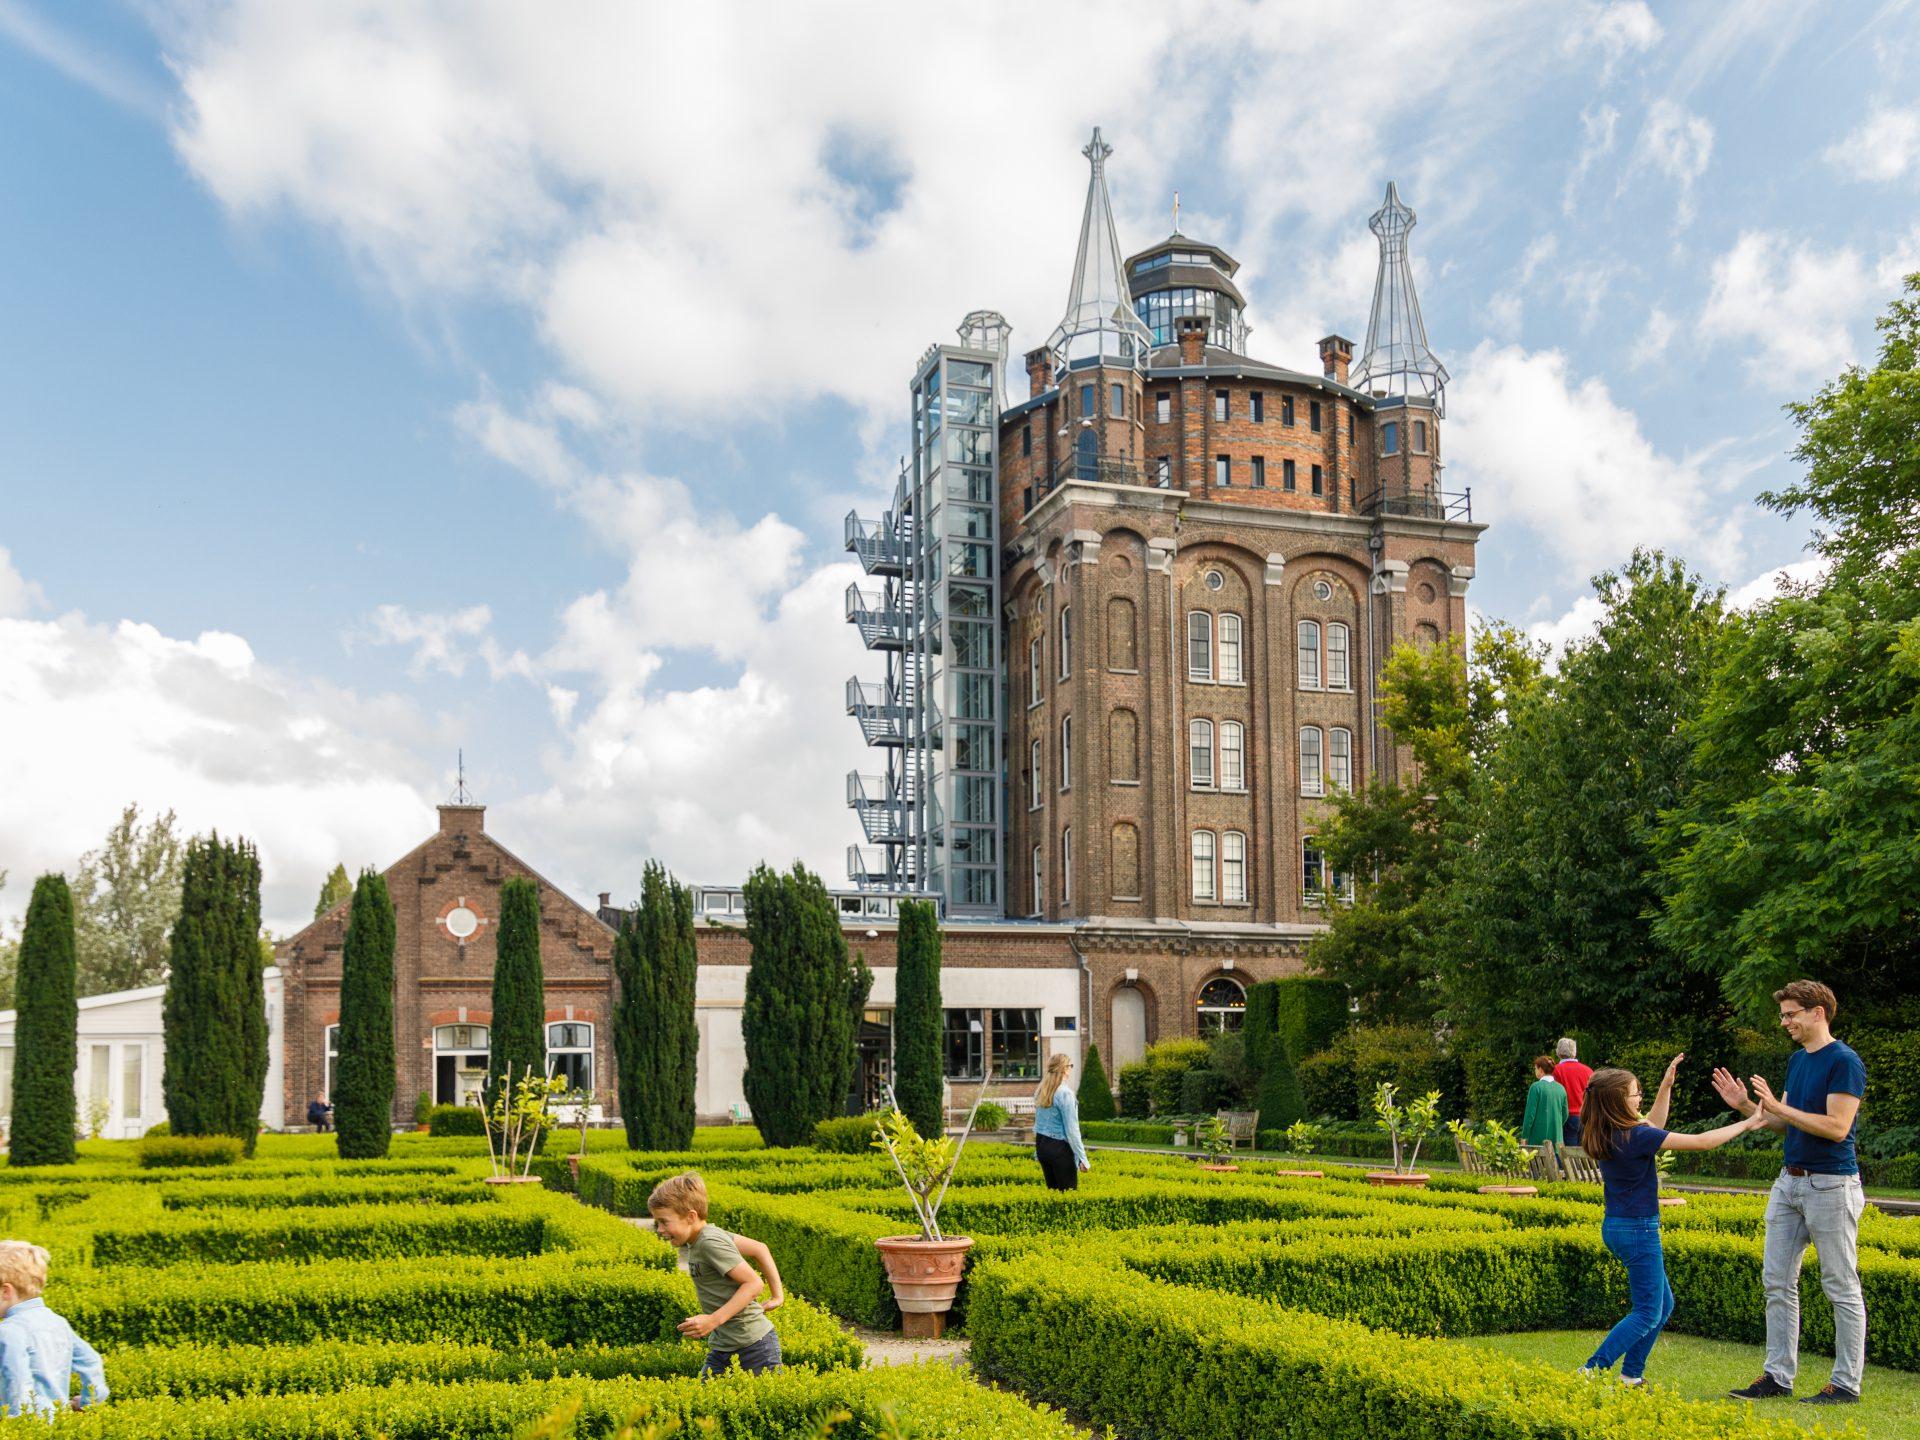 Hotel Villa Augustus - Dordrecht - tuin - watertoren